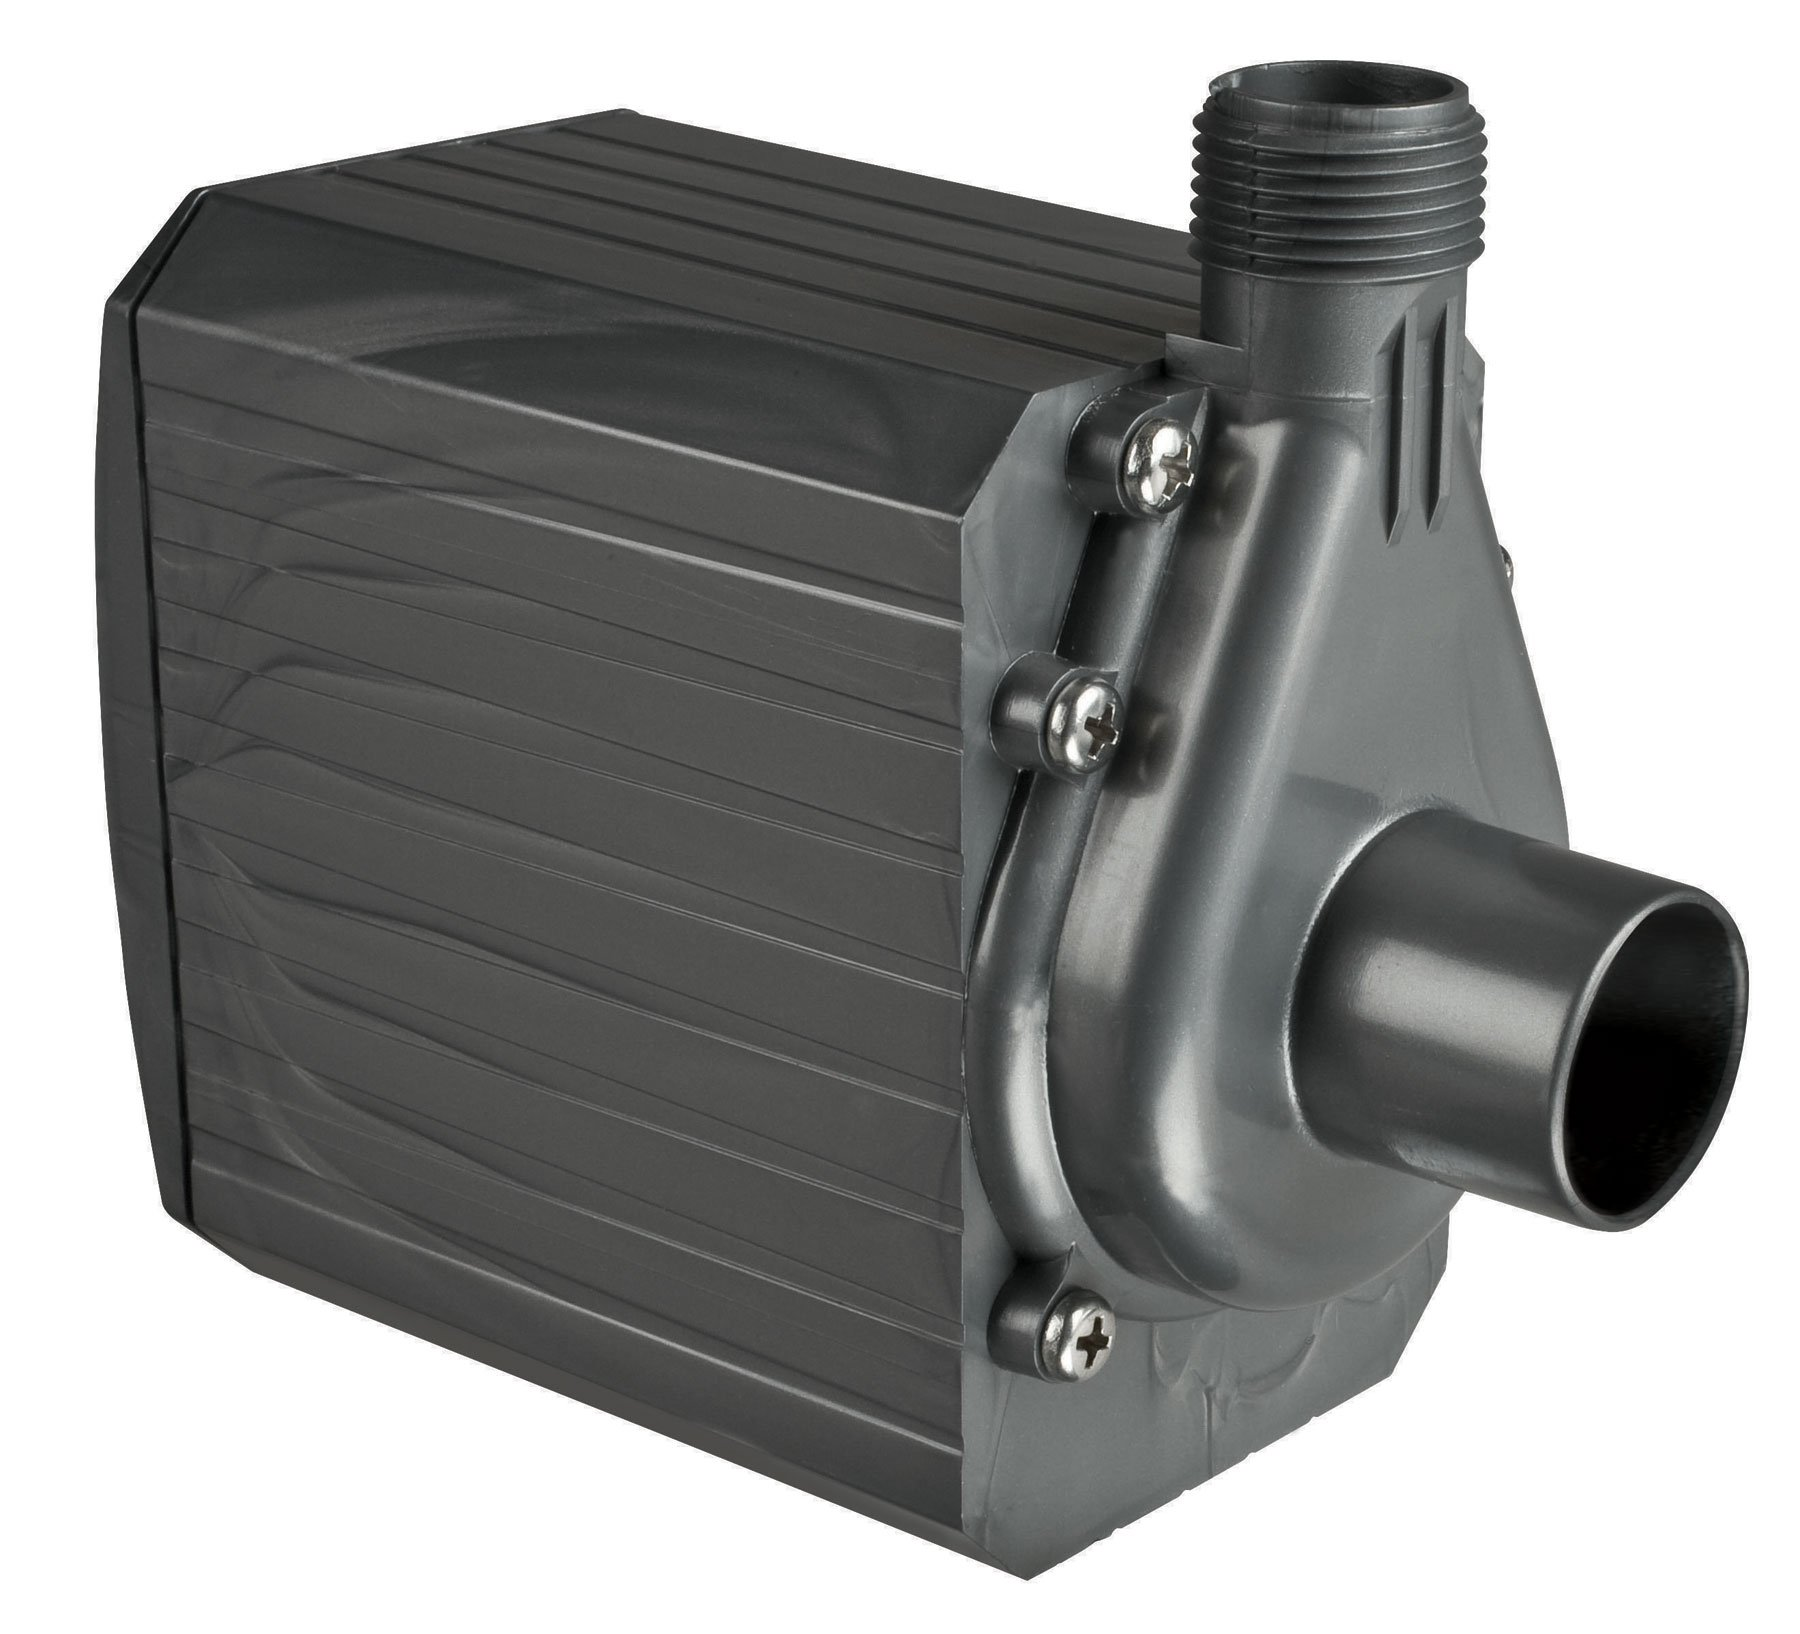 Danner Manufacturing, Inc. Supreme Hydro-Mag Recirculating Water & Air Pump with Venturi, 1800PH, #40138 by DANNER MANUFACTURING